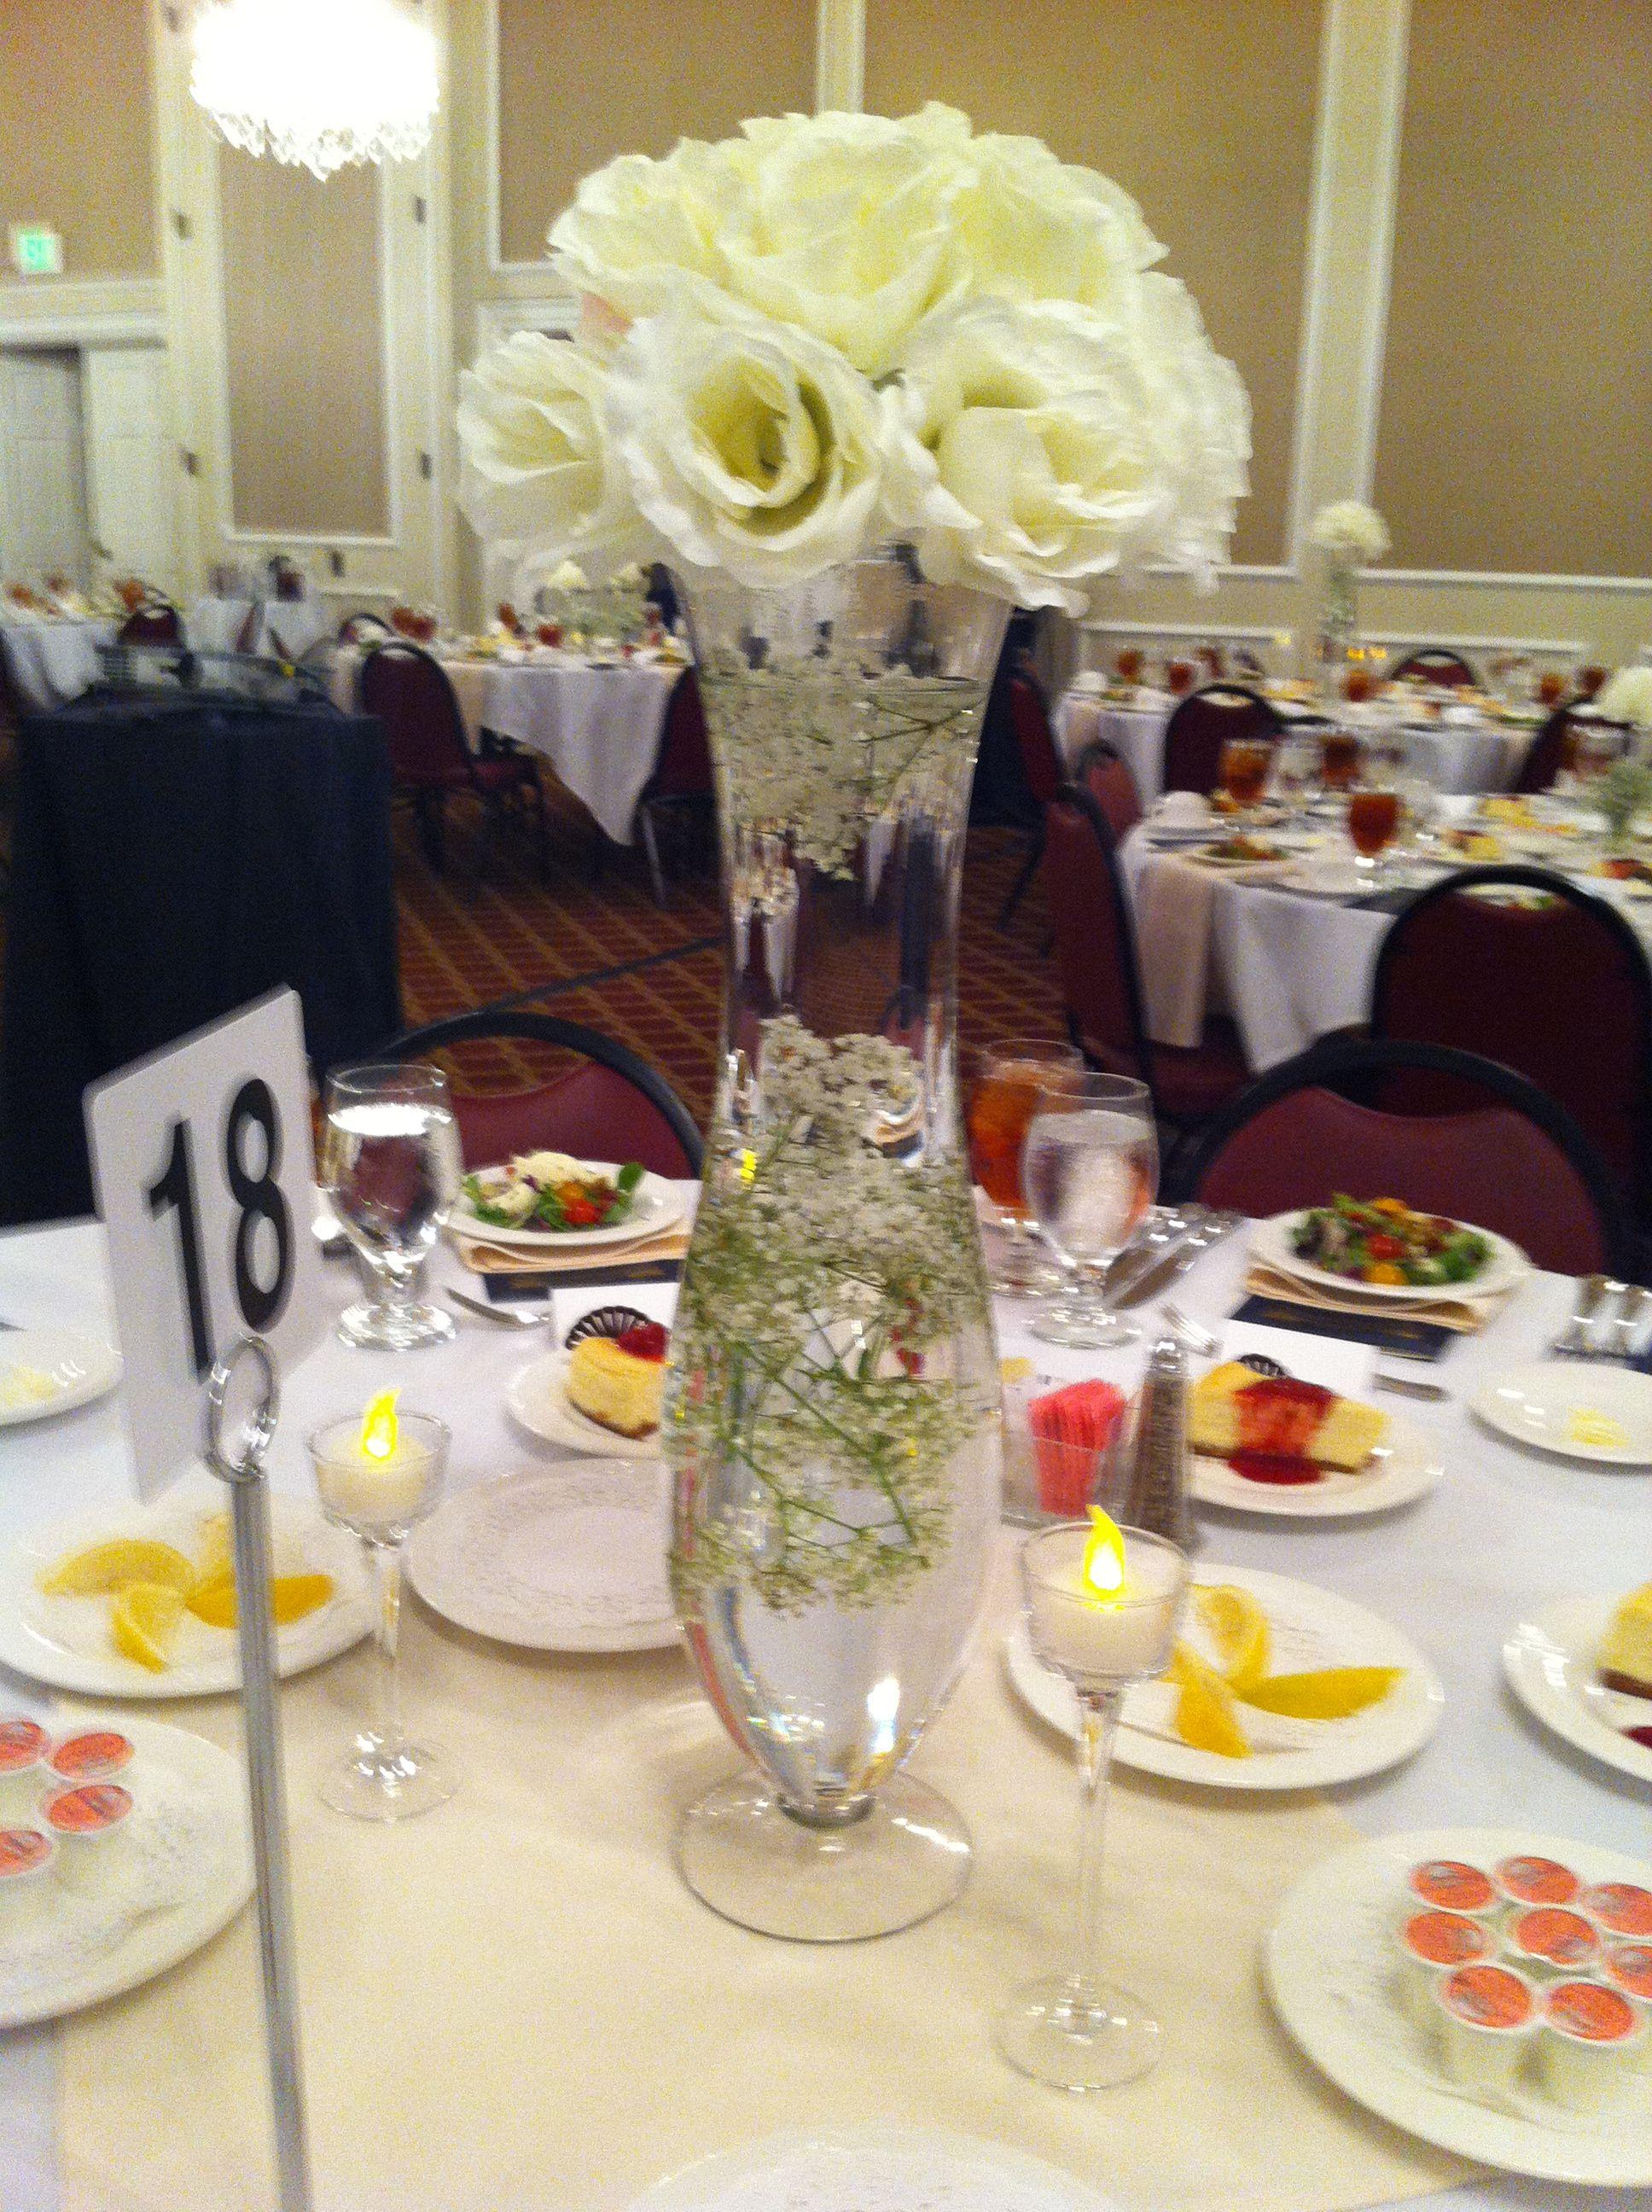 College Legacy Banquet Table Centerpiece Event Decor Table